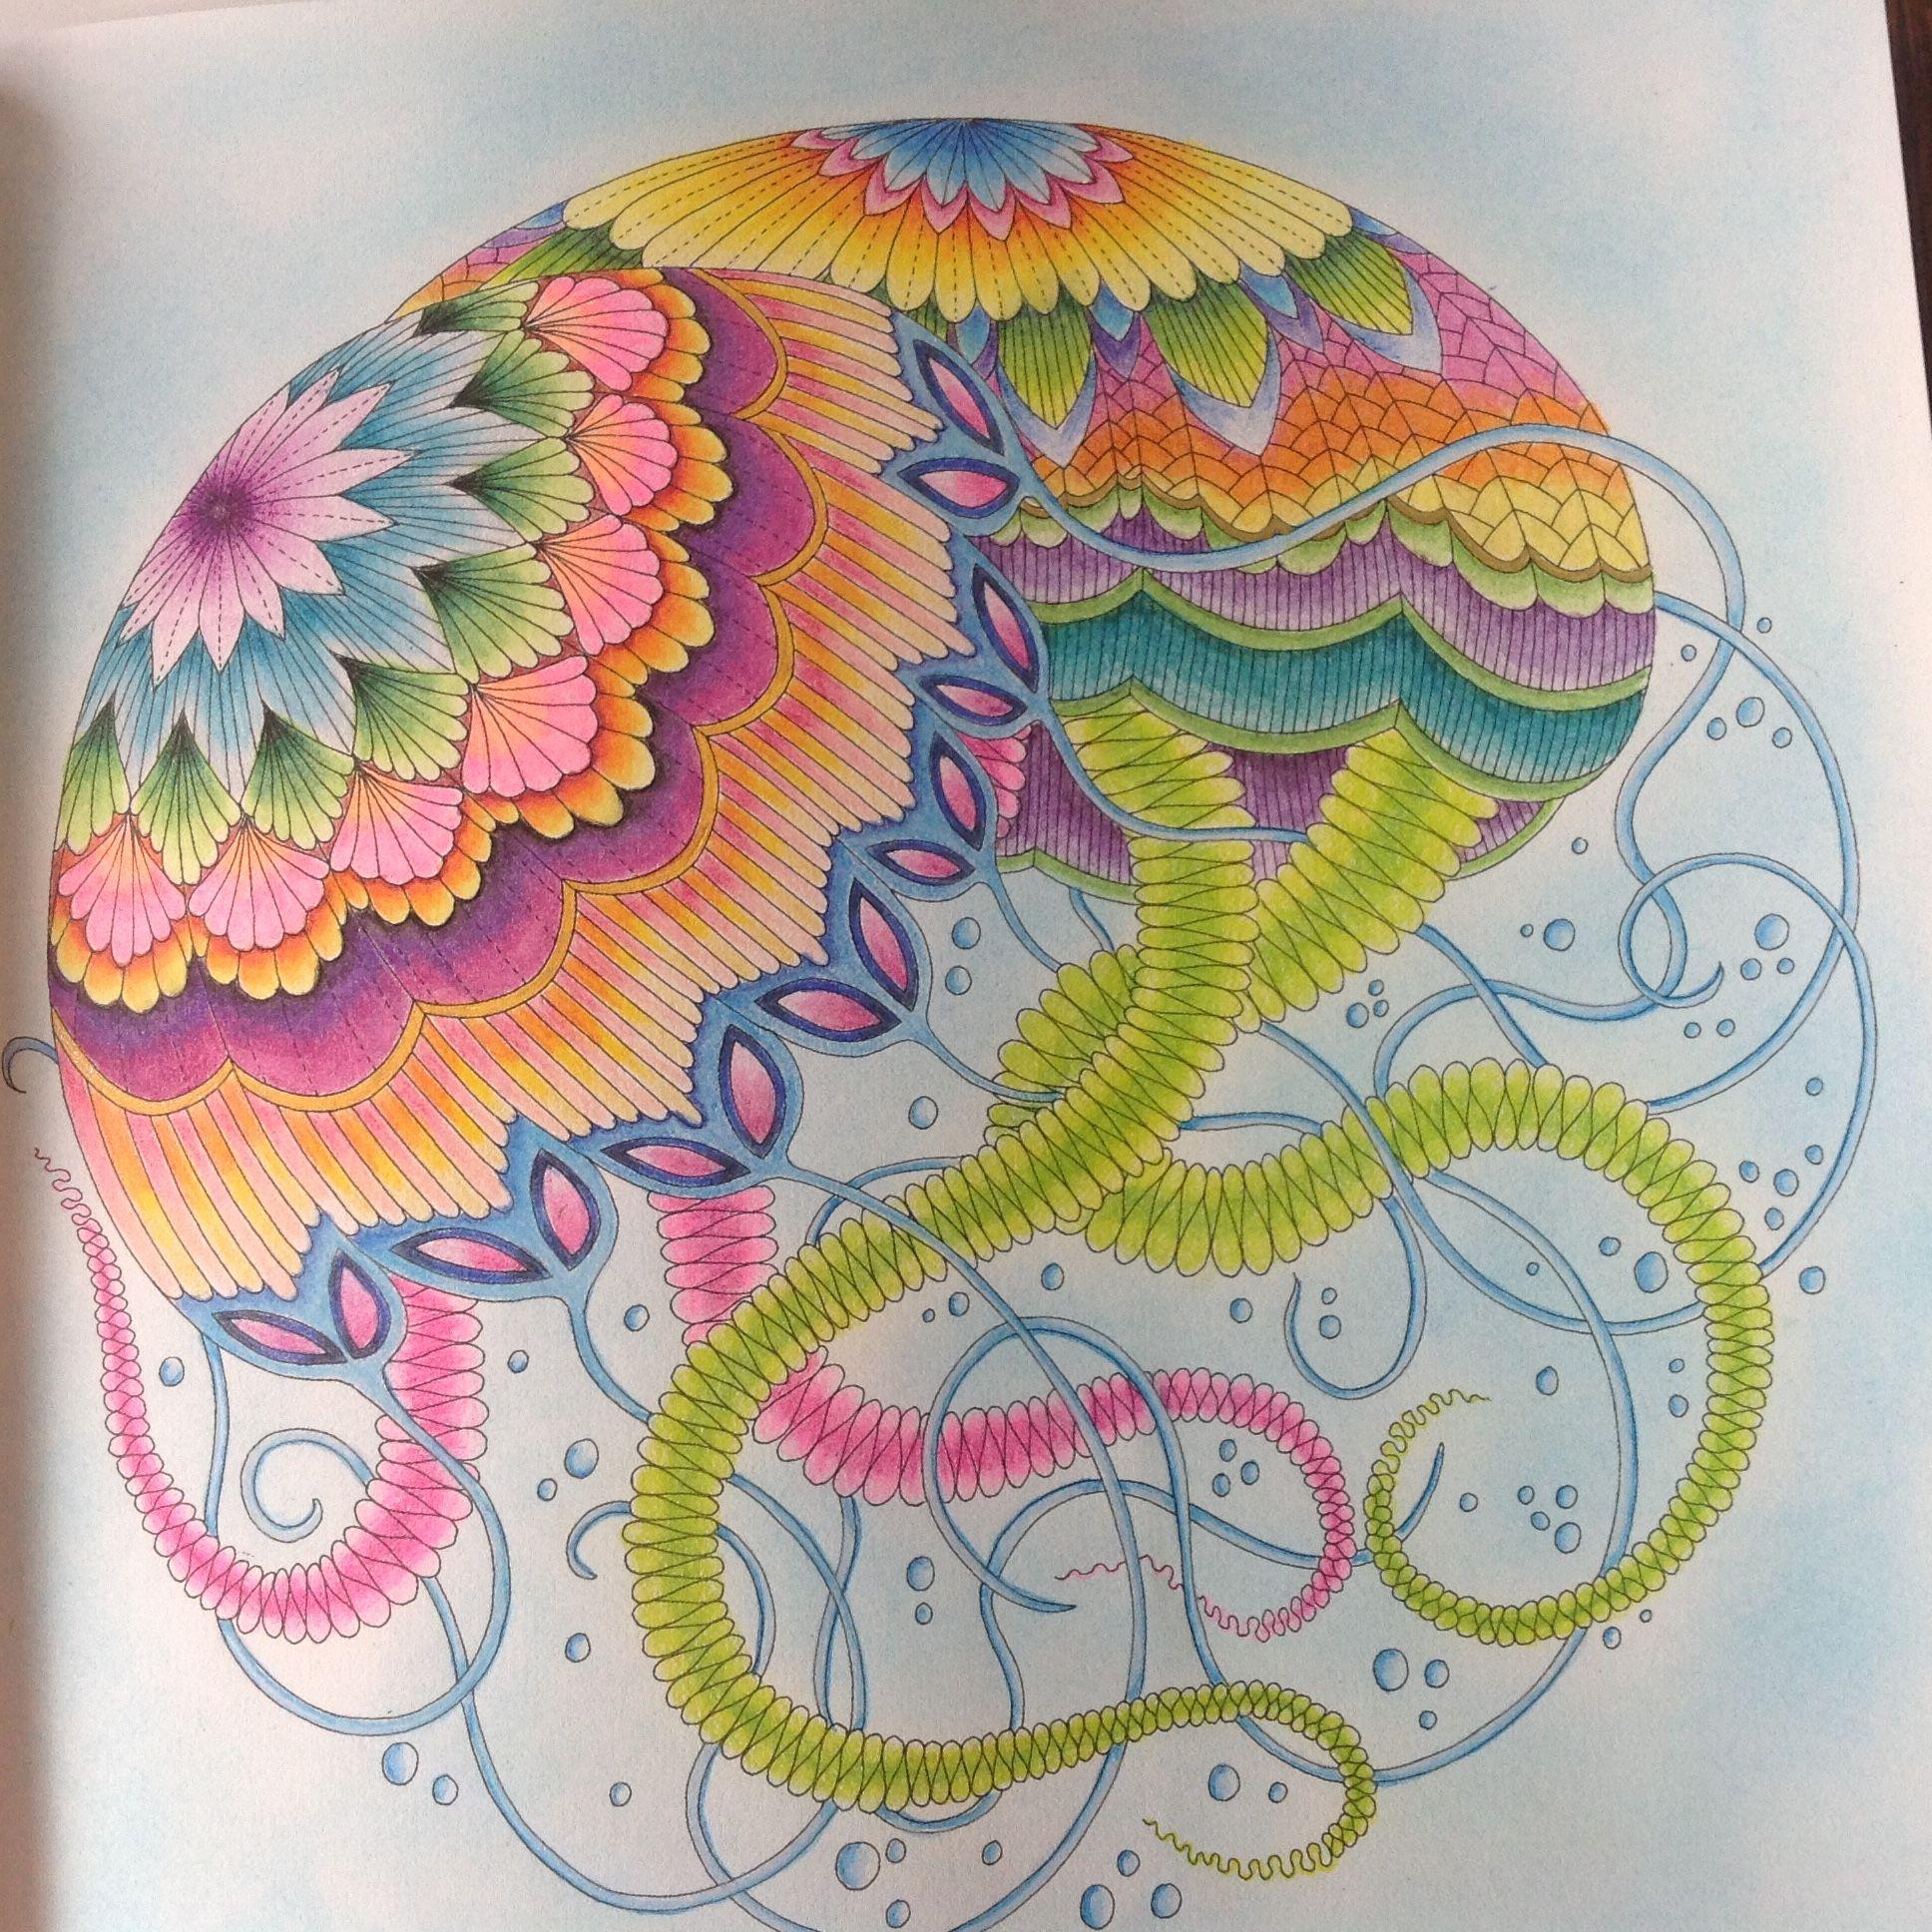 Adult Coloring Books Jellyfish Paisley Calm Tropical Mandalas Nature Drawings